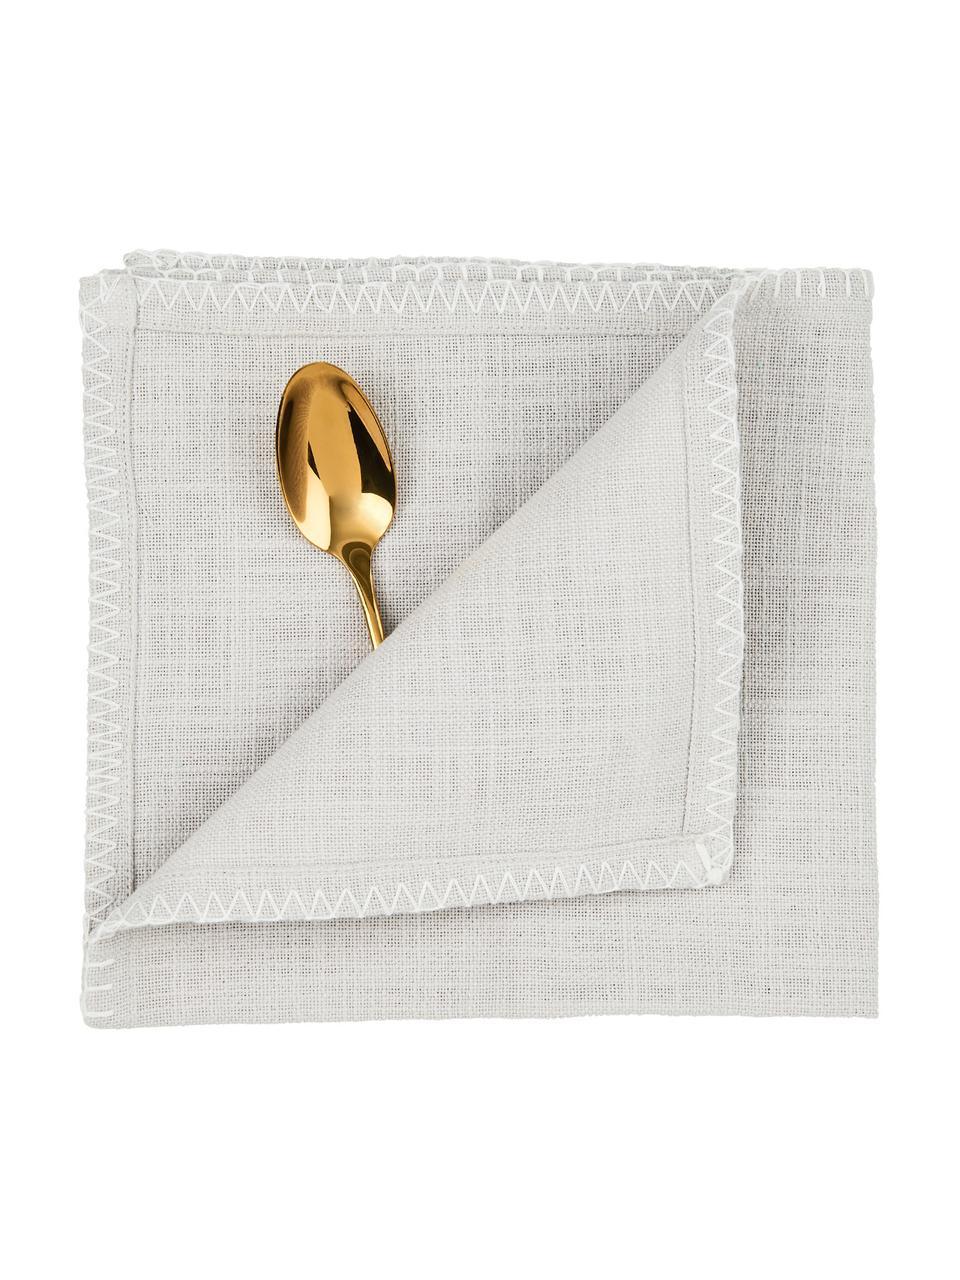 Stoff-Servietten Finca, 2 Stück, Baumwolle, Grau, 42 x 42 cm